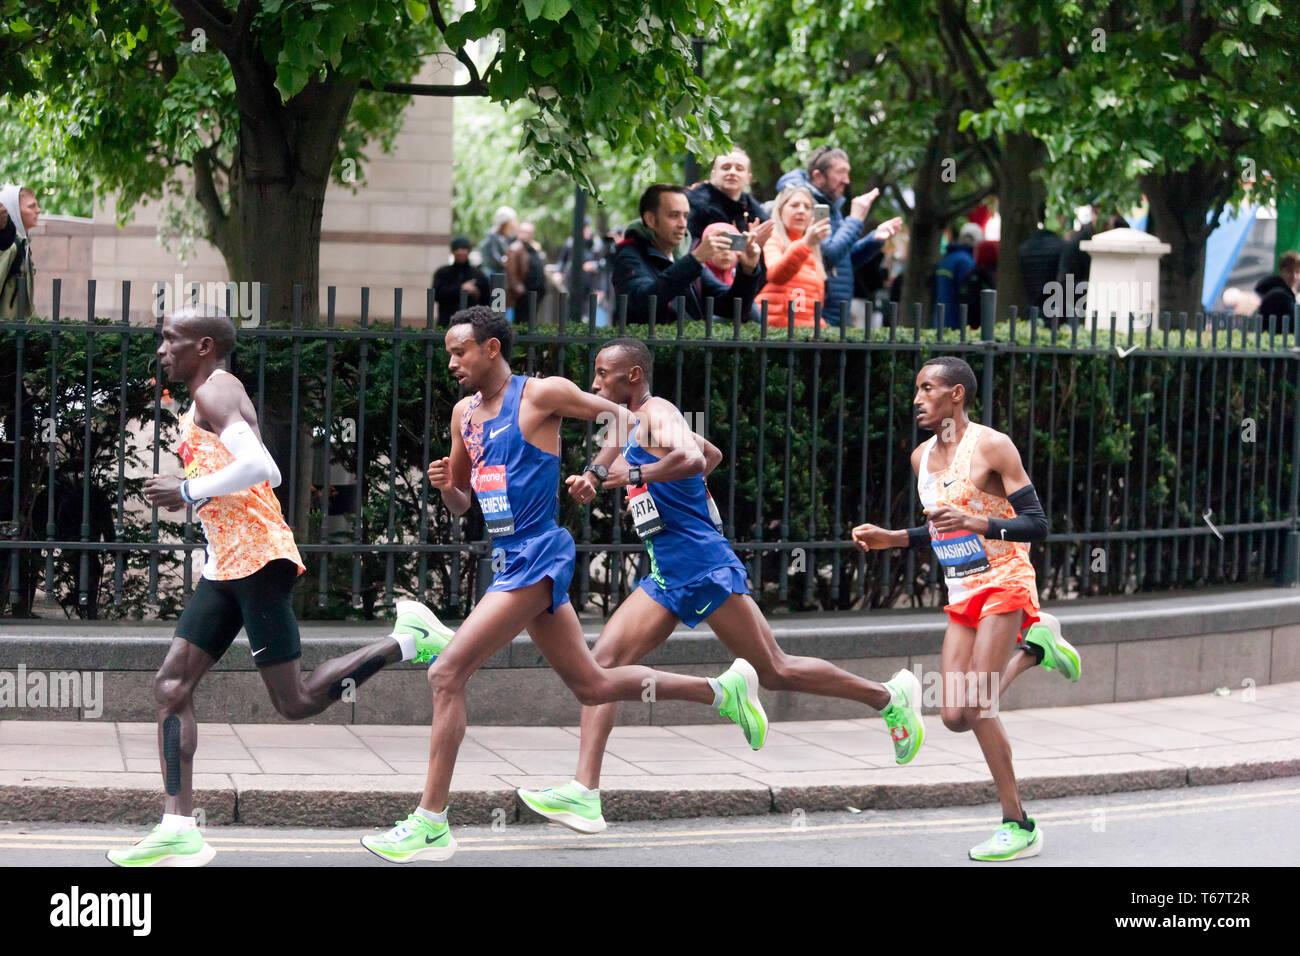 Eliud Kipchoge from Kenya, leading  the men's Elite 2019 London Marathon, from Mosinet Geremew, Tola Shura Kitata and Mule Wasihun, Eliud  went onto win in a time of 02:02:37 - Stock Image